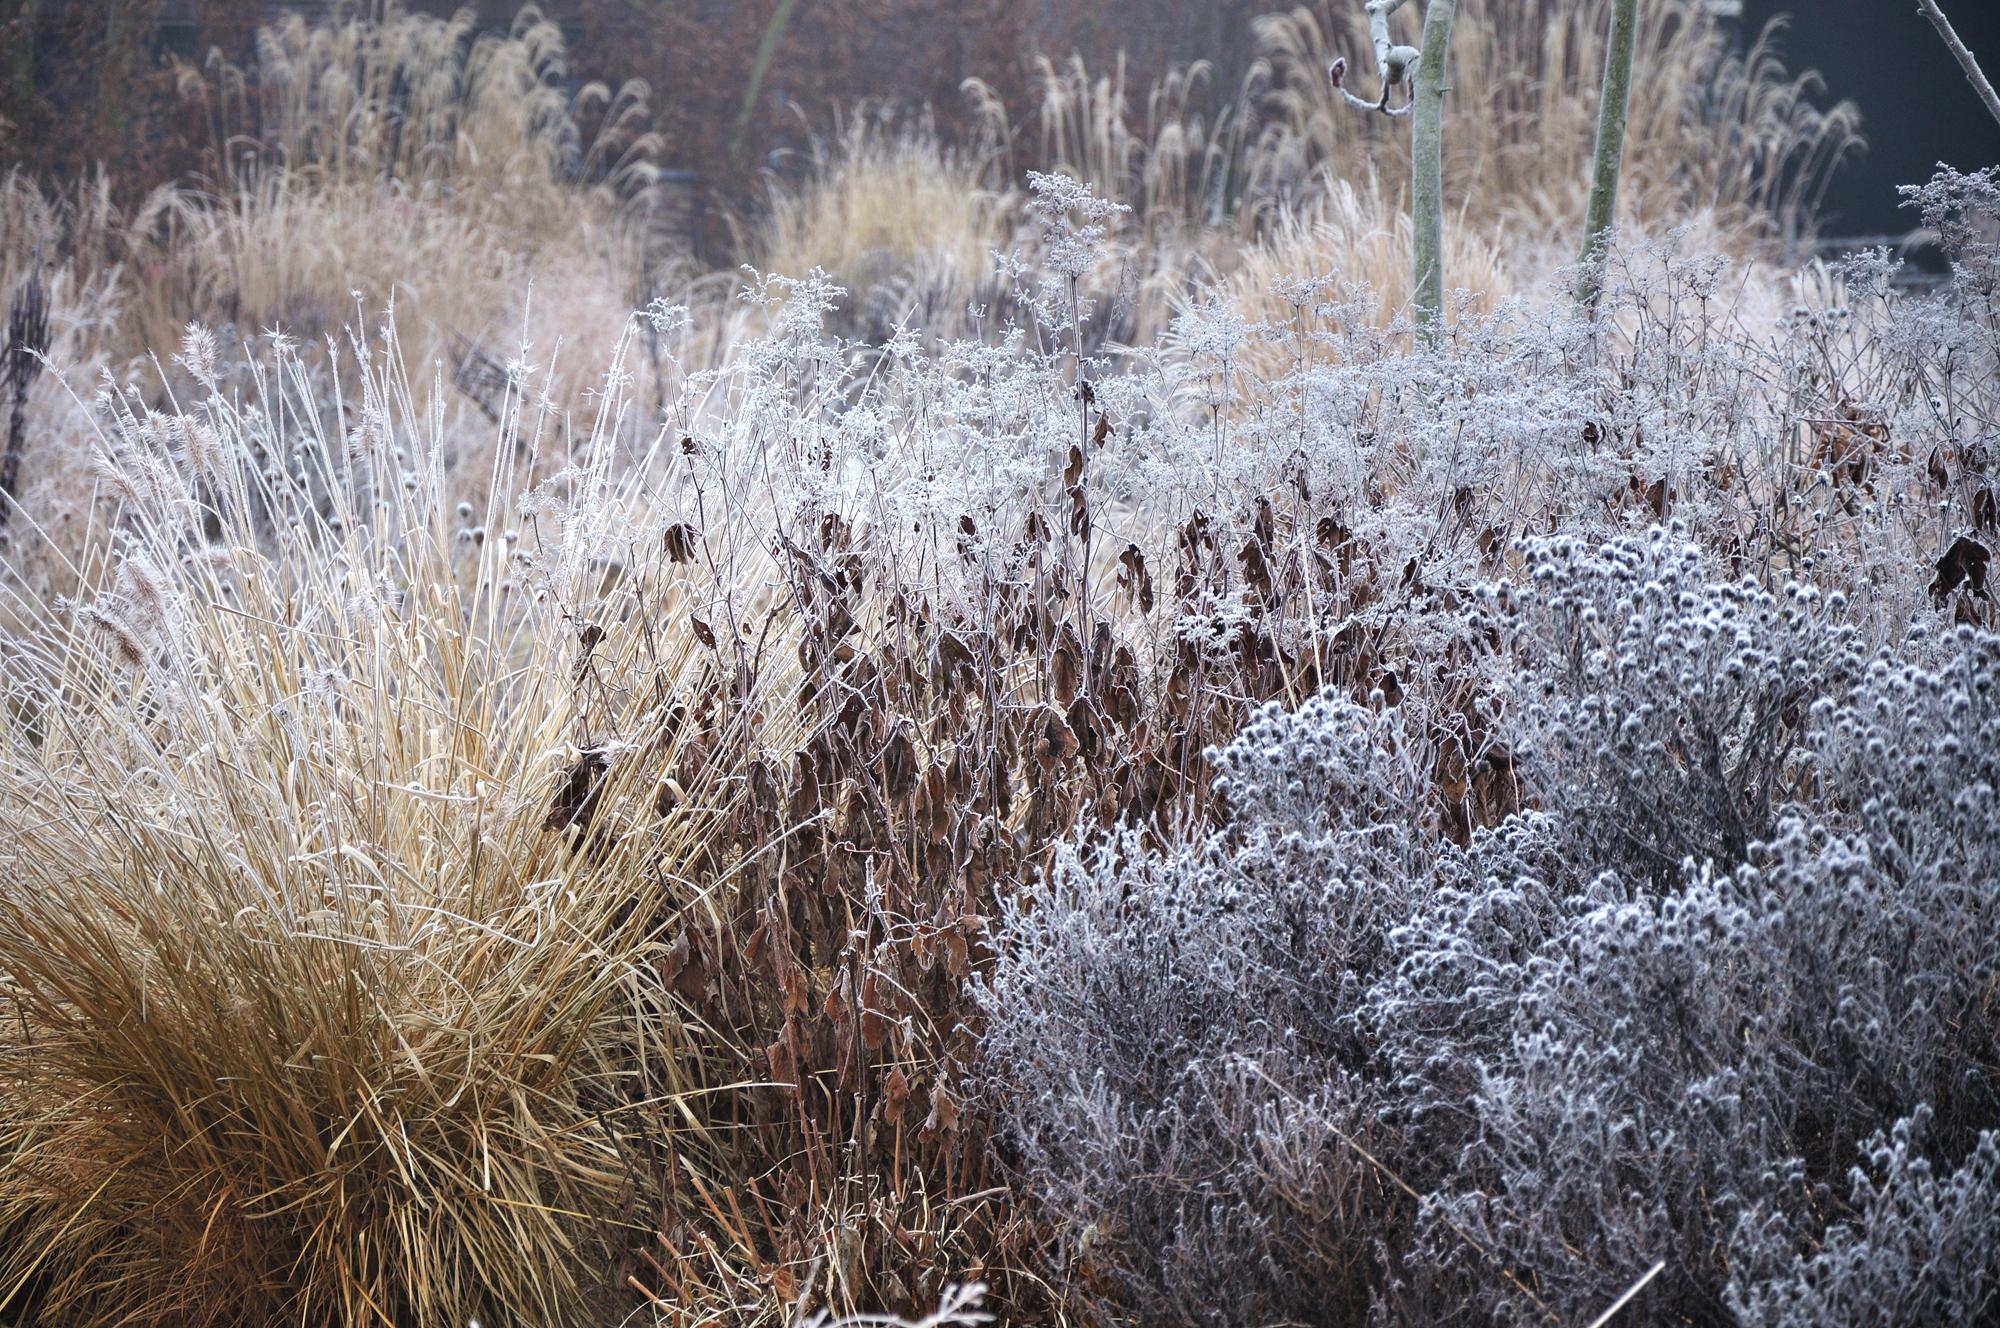 Frank-Heijligers-Dutch-Winter-Garden-Grasses-9.jpg